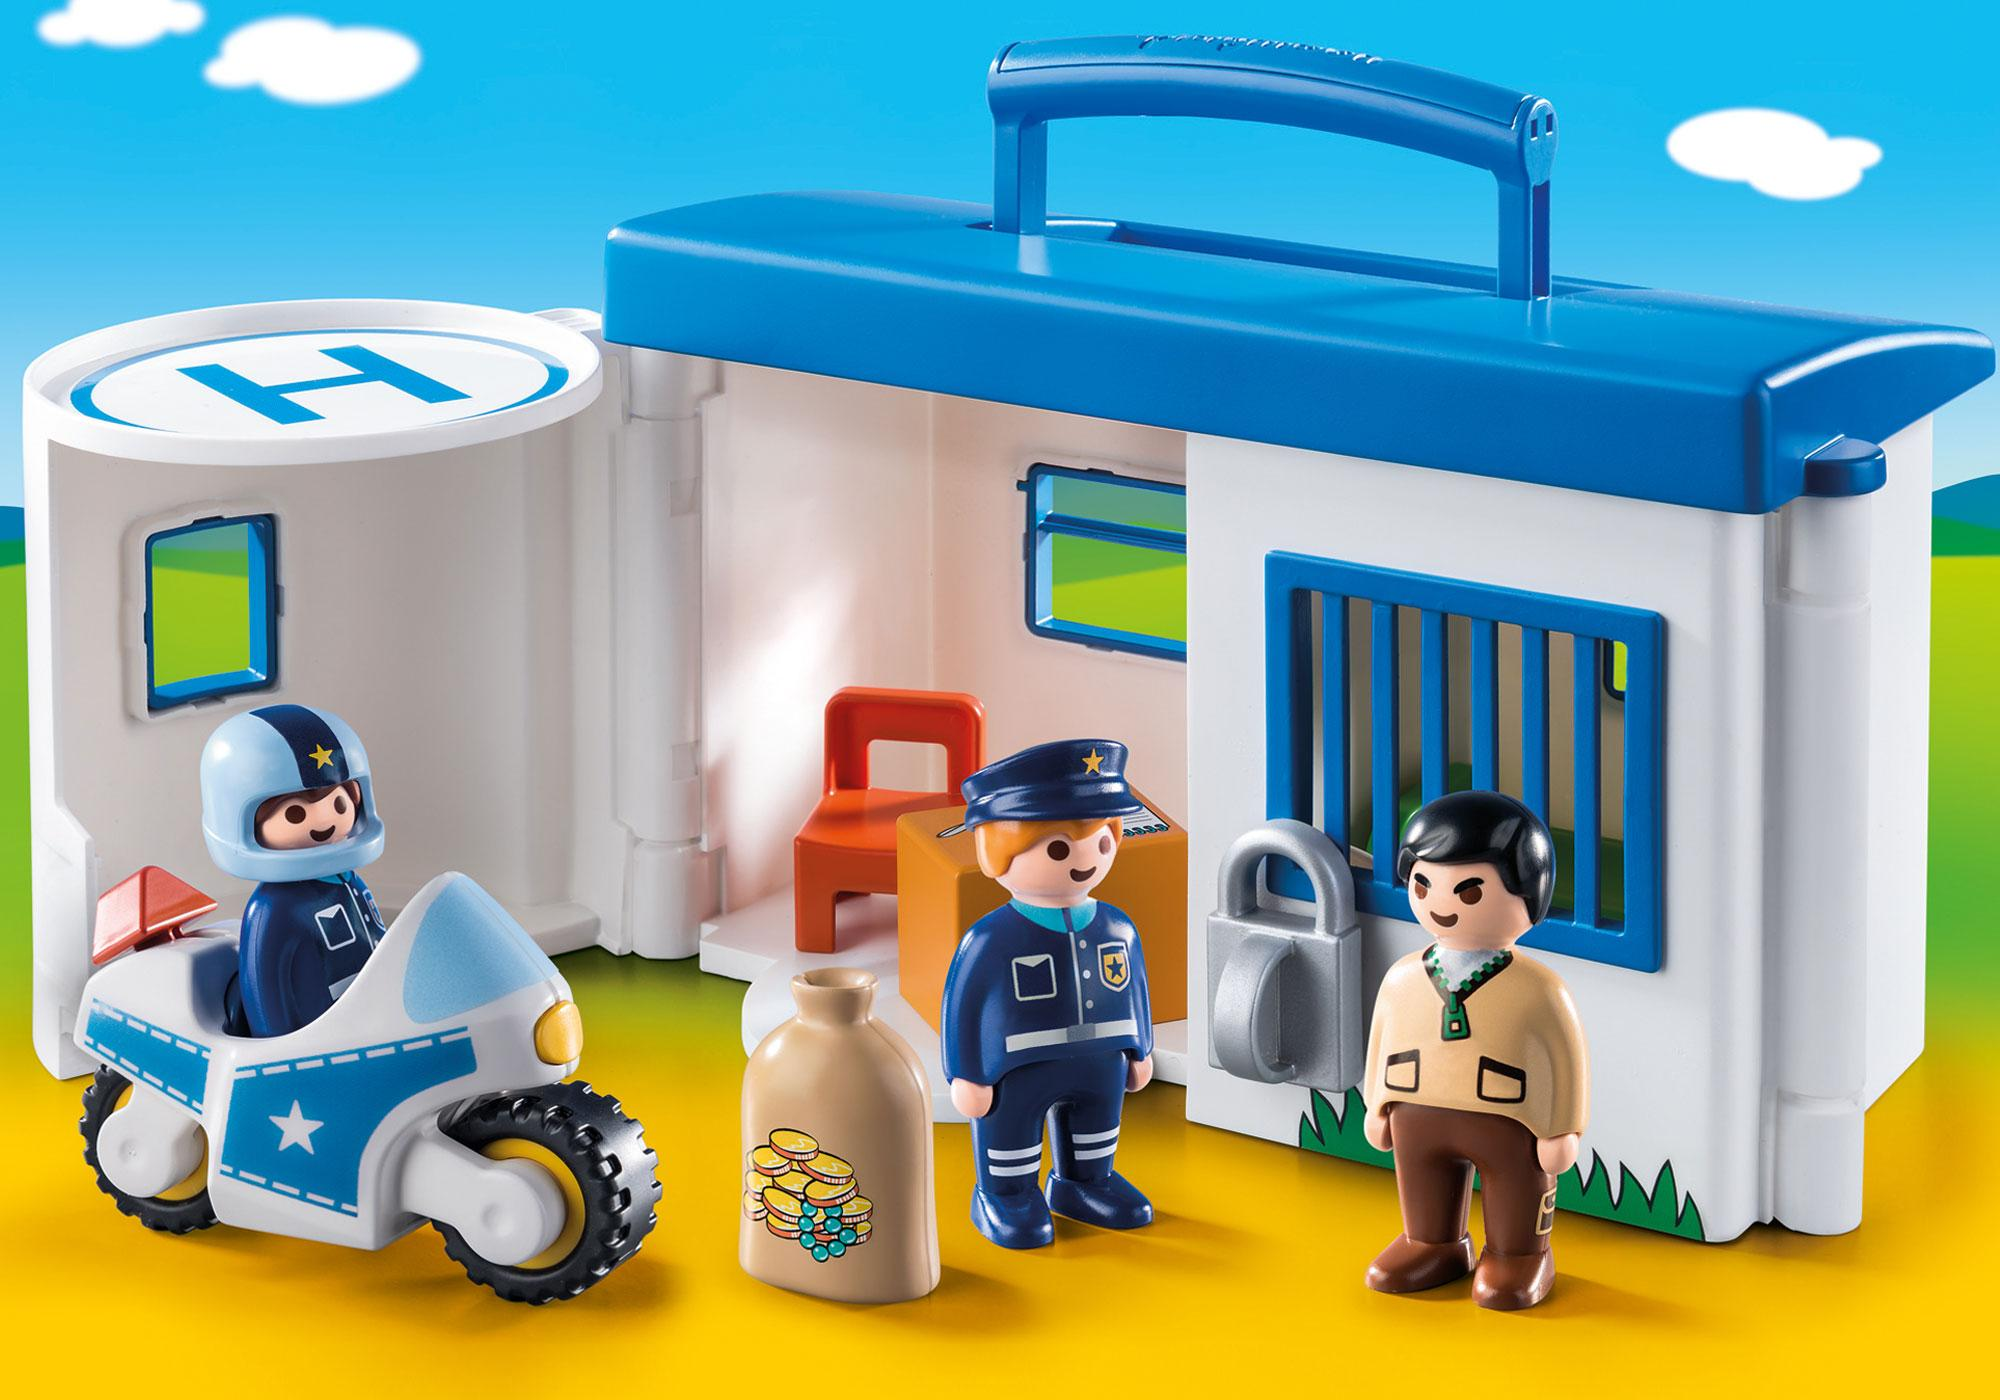 http://media.playmobil.com/i/playmobil/9382_product_detail/Meine Mitnehm-Polizeistation